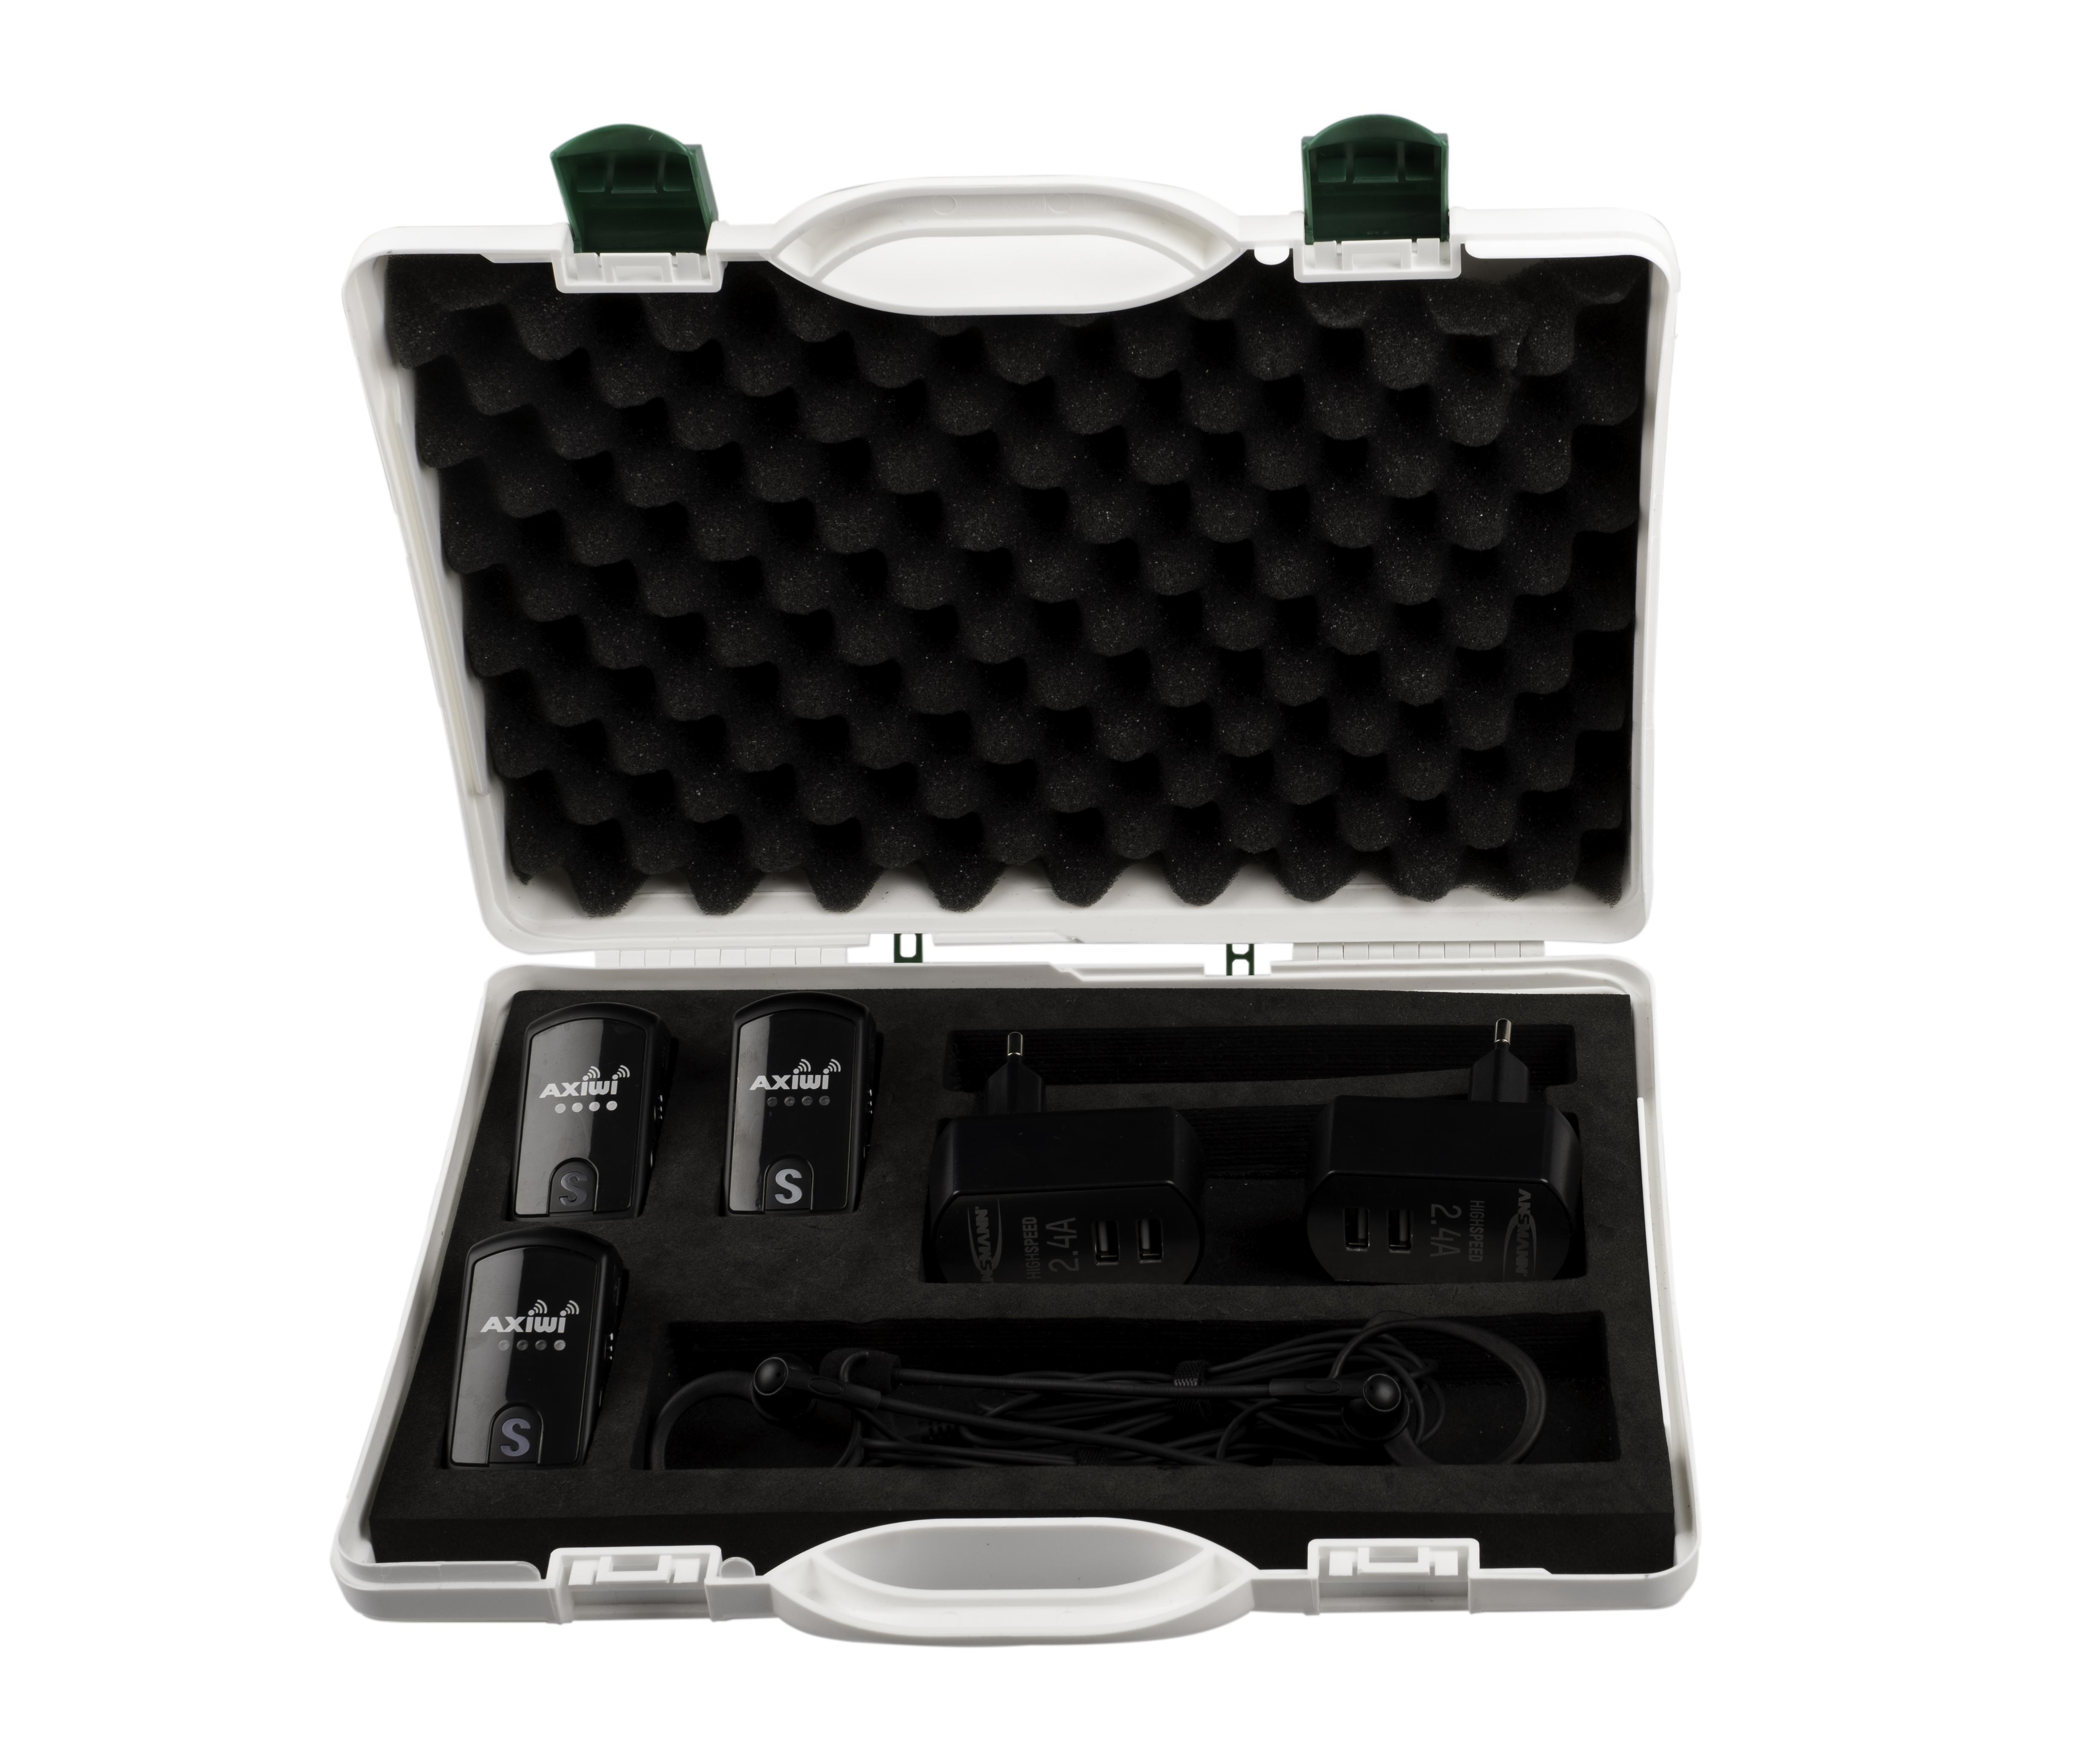 axiwi-ref-002-scheidsrechter-communicatie-systeem-koffer-3-units-binnenkant